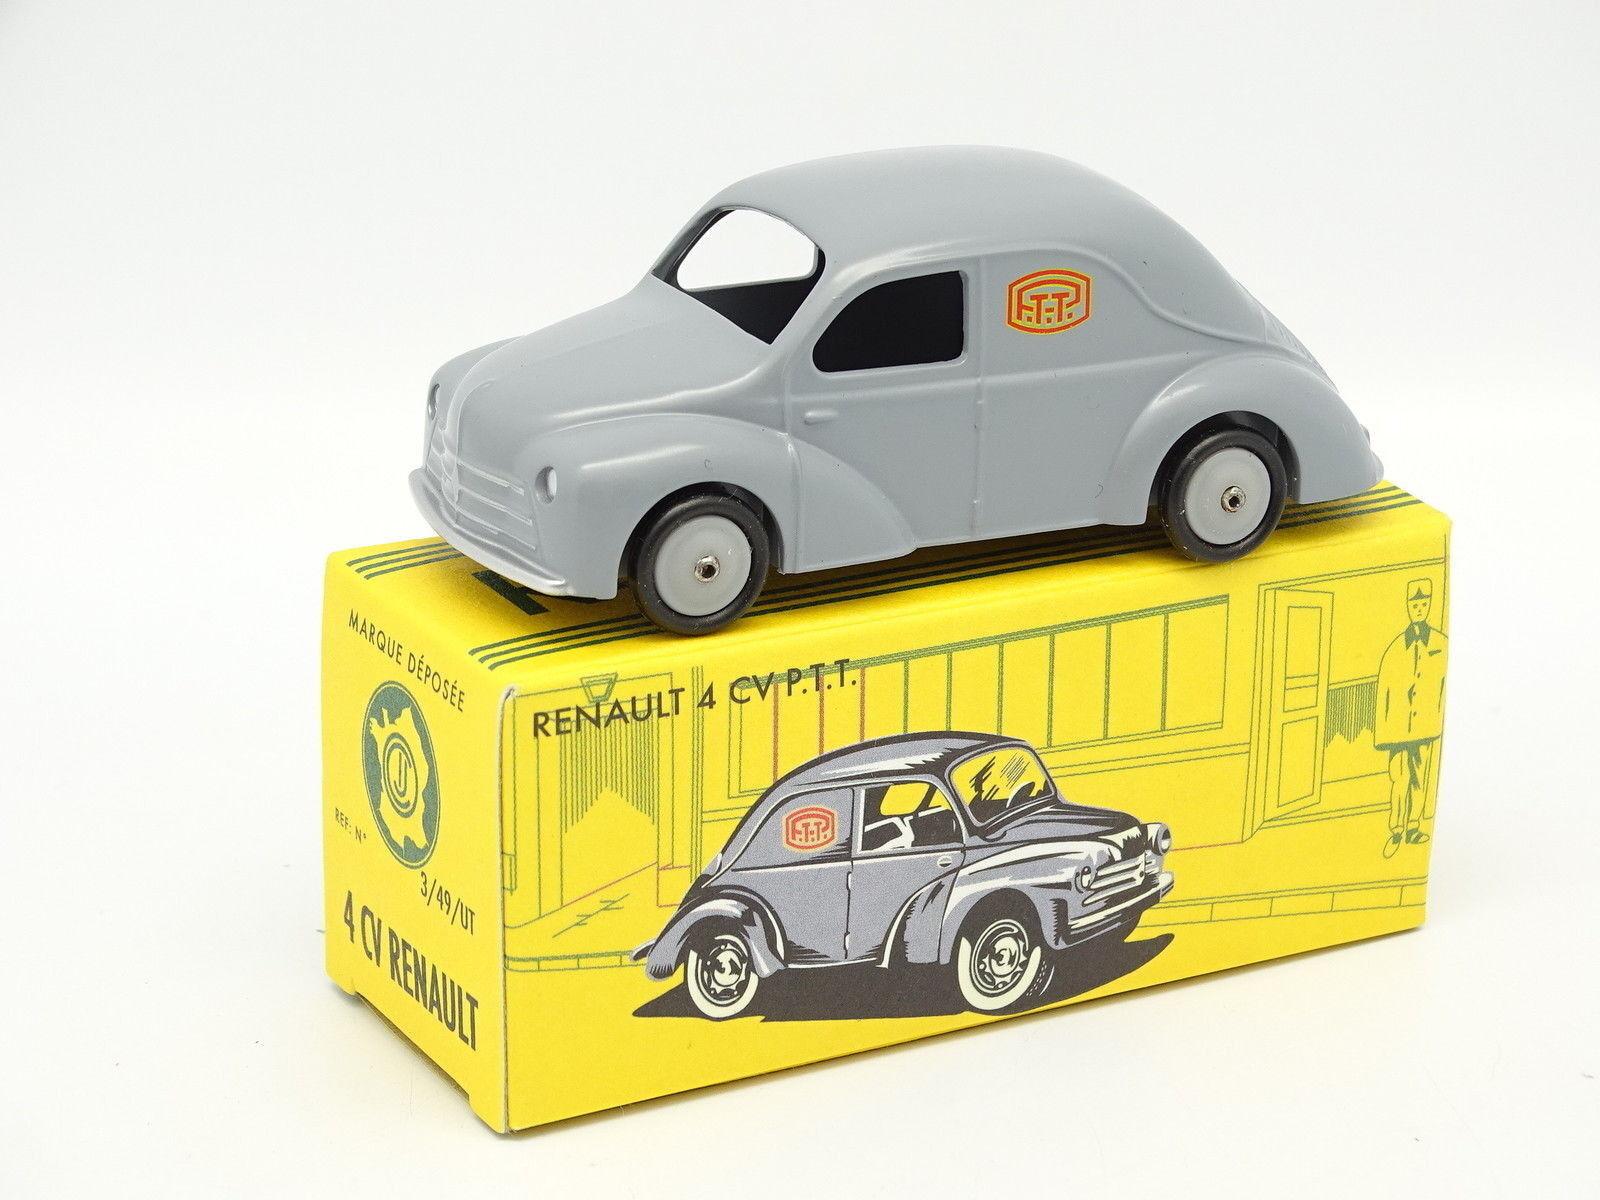 CIJ By Norev 1 43 - Renault Renault Renault 4CV PTT 779c87